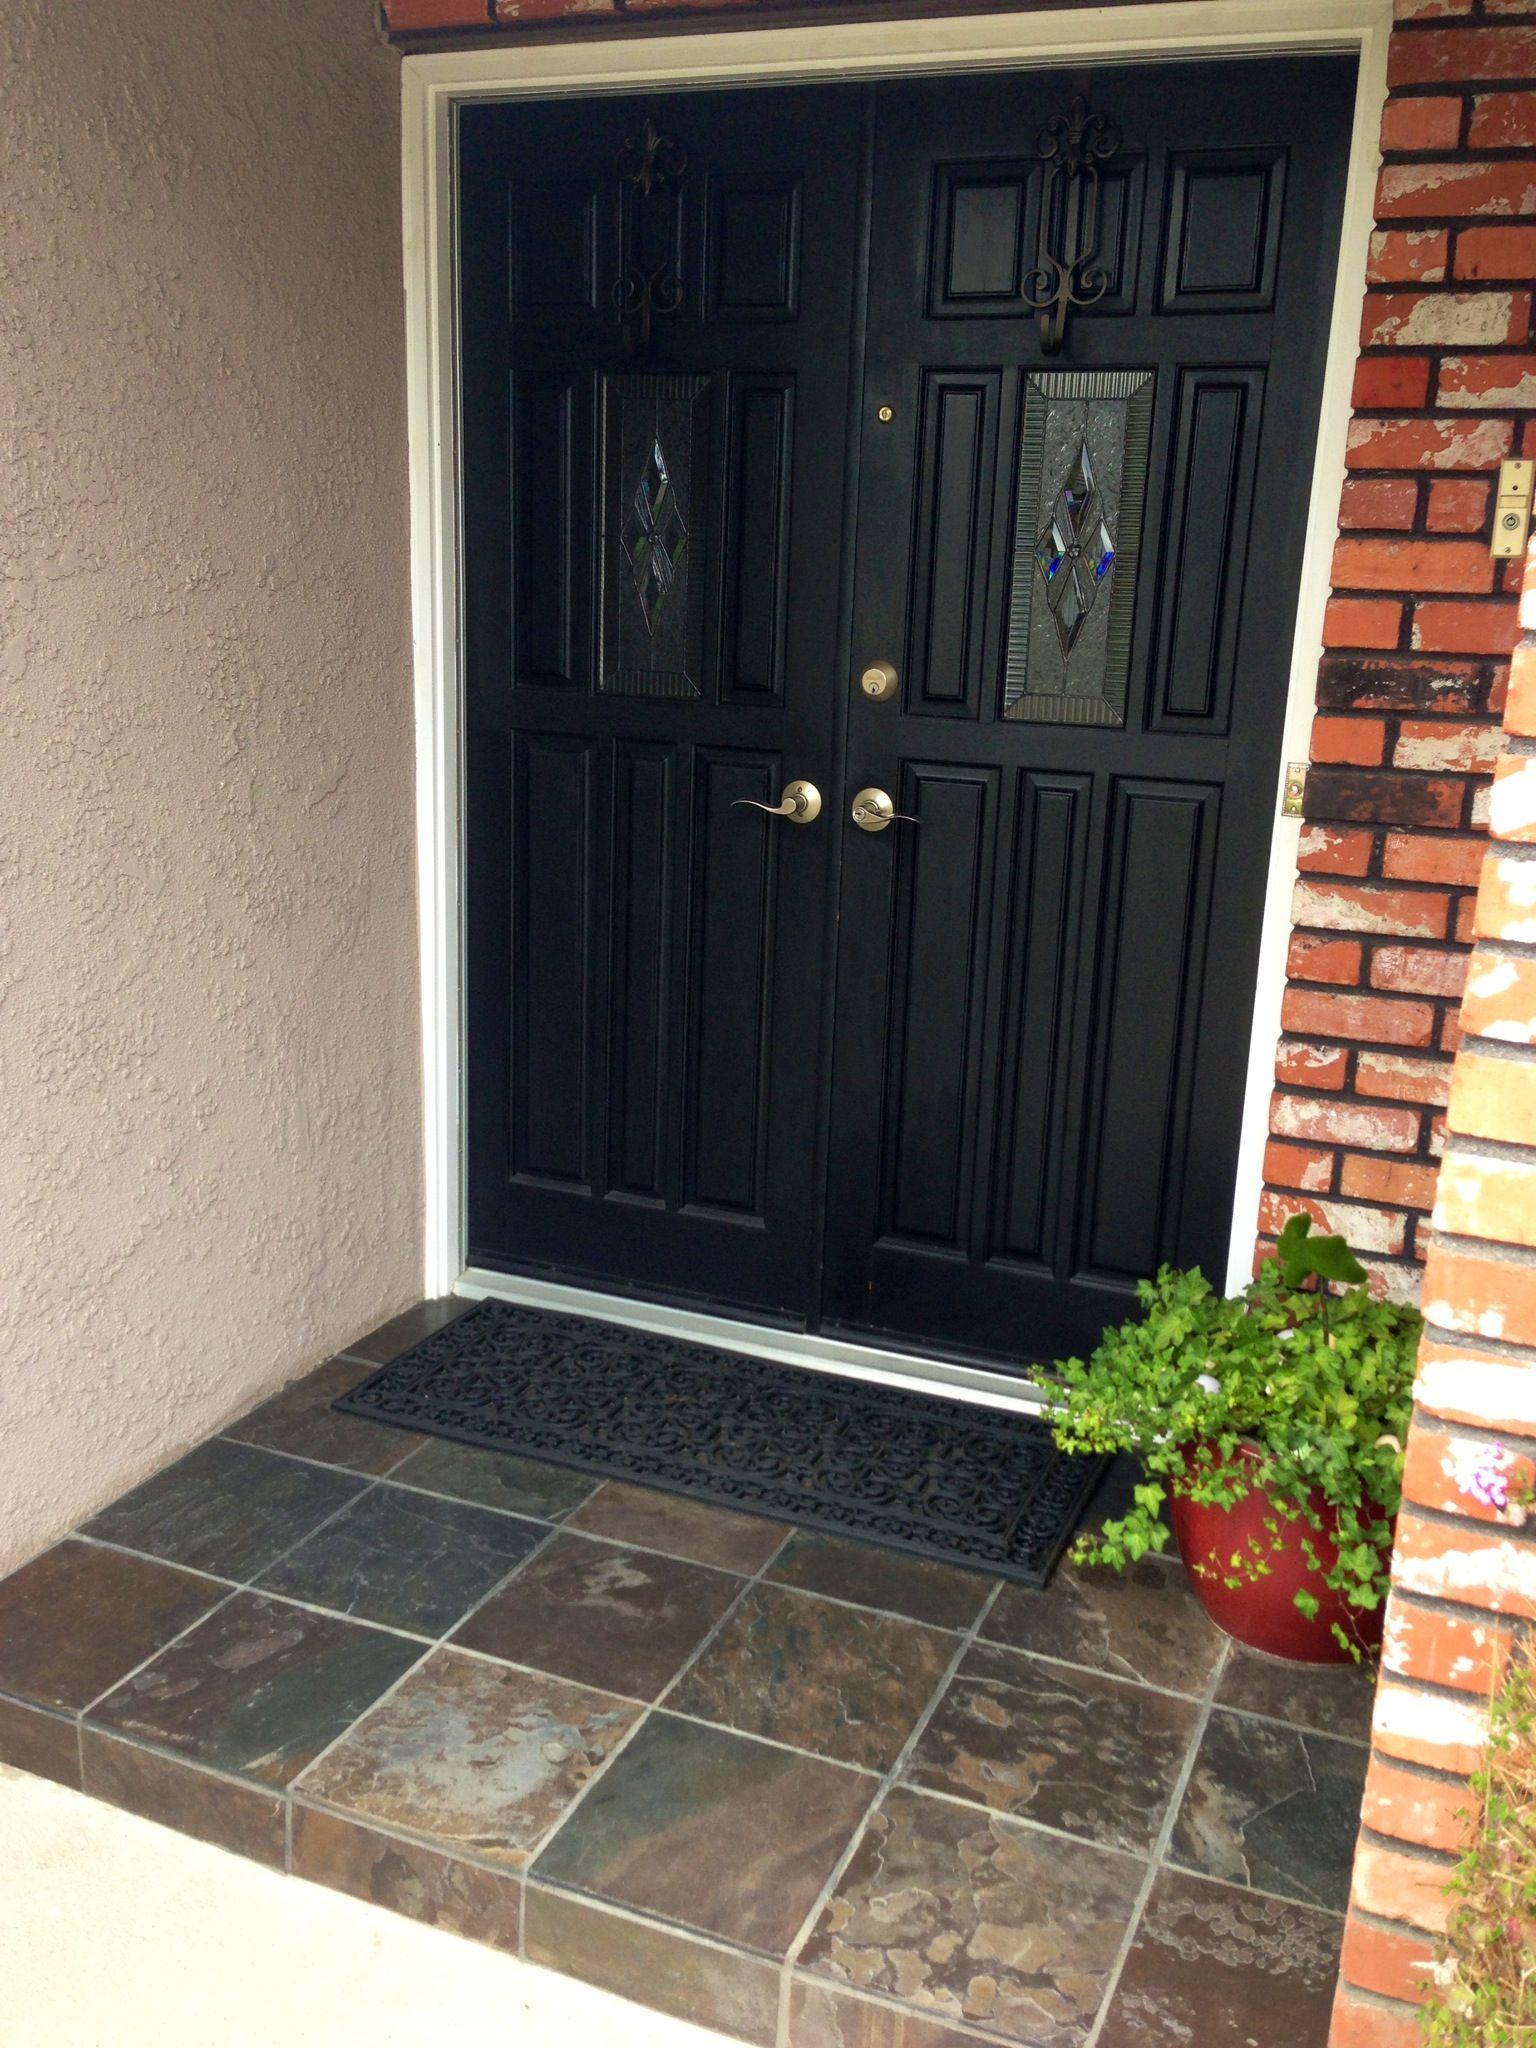 Slate Tile On Front Porch Dresses Up Entry Front Porch Steps